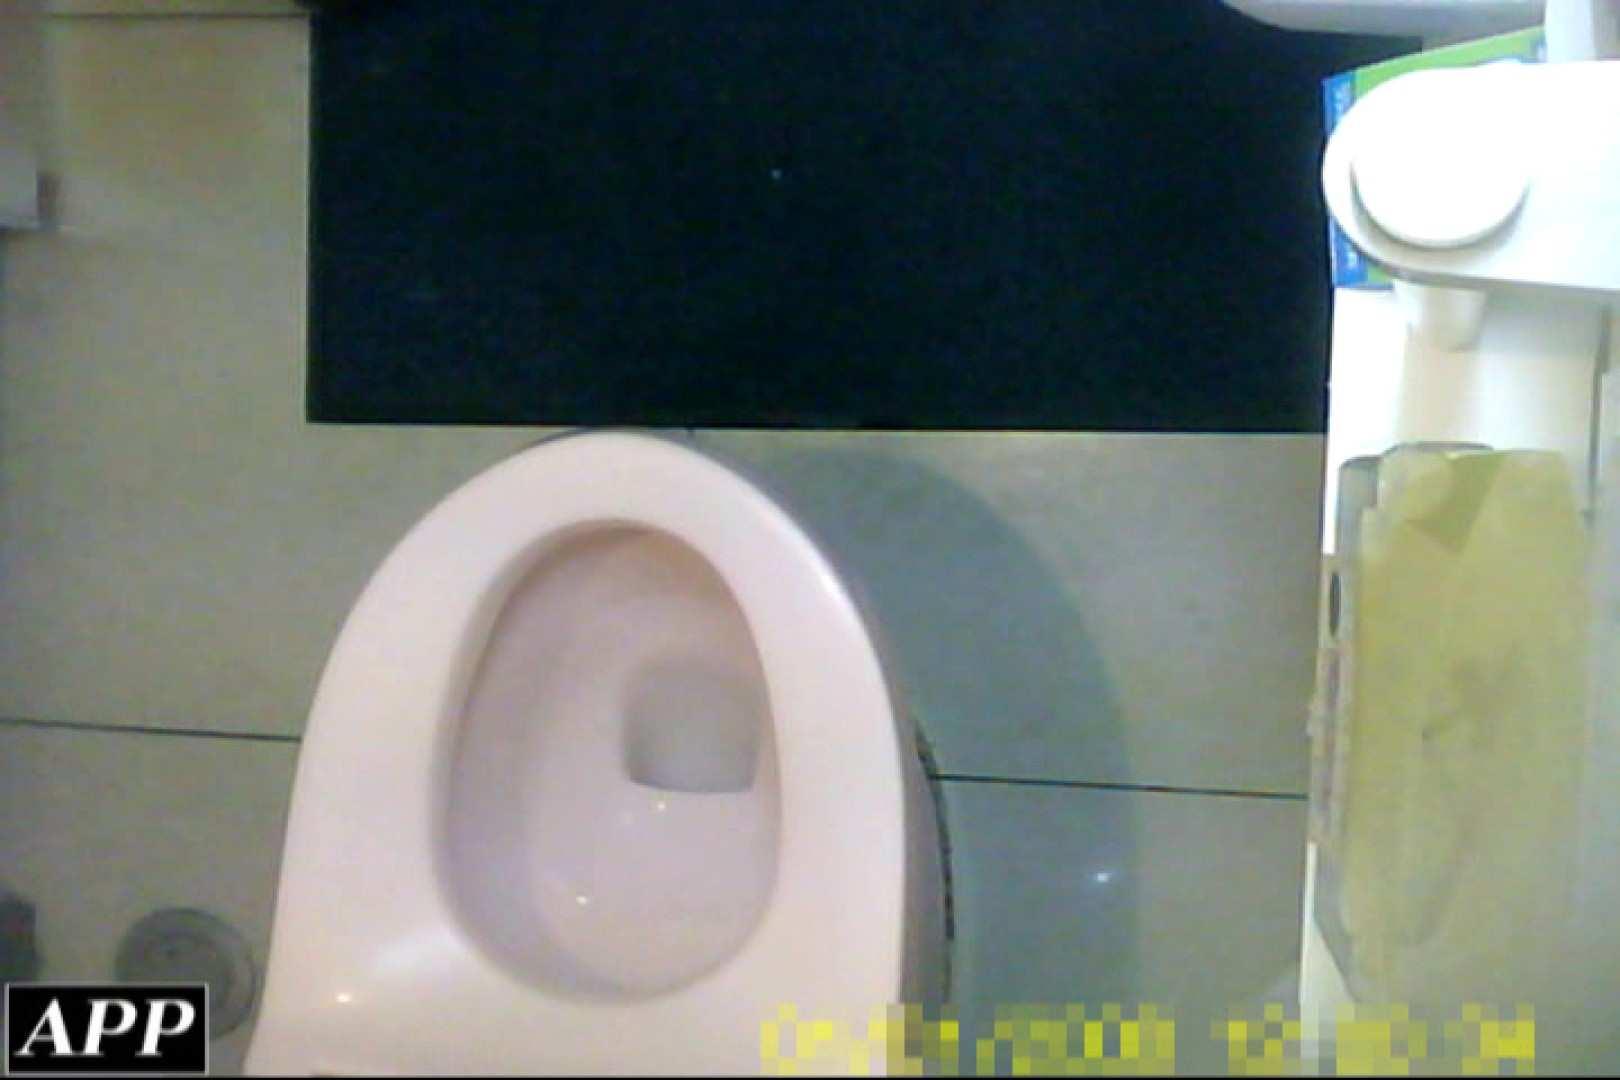 3視点洗面所 vol.041 洗面所 | OLセックス  52画像 29